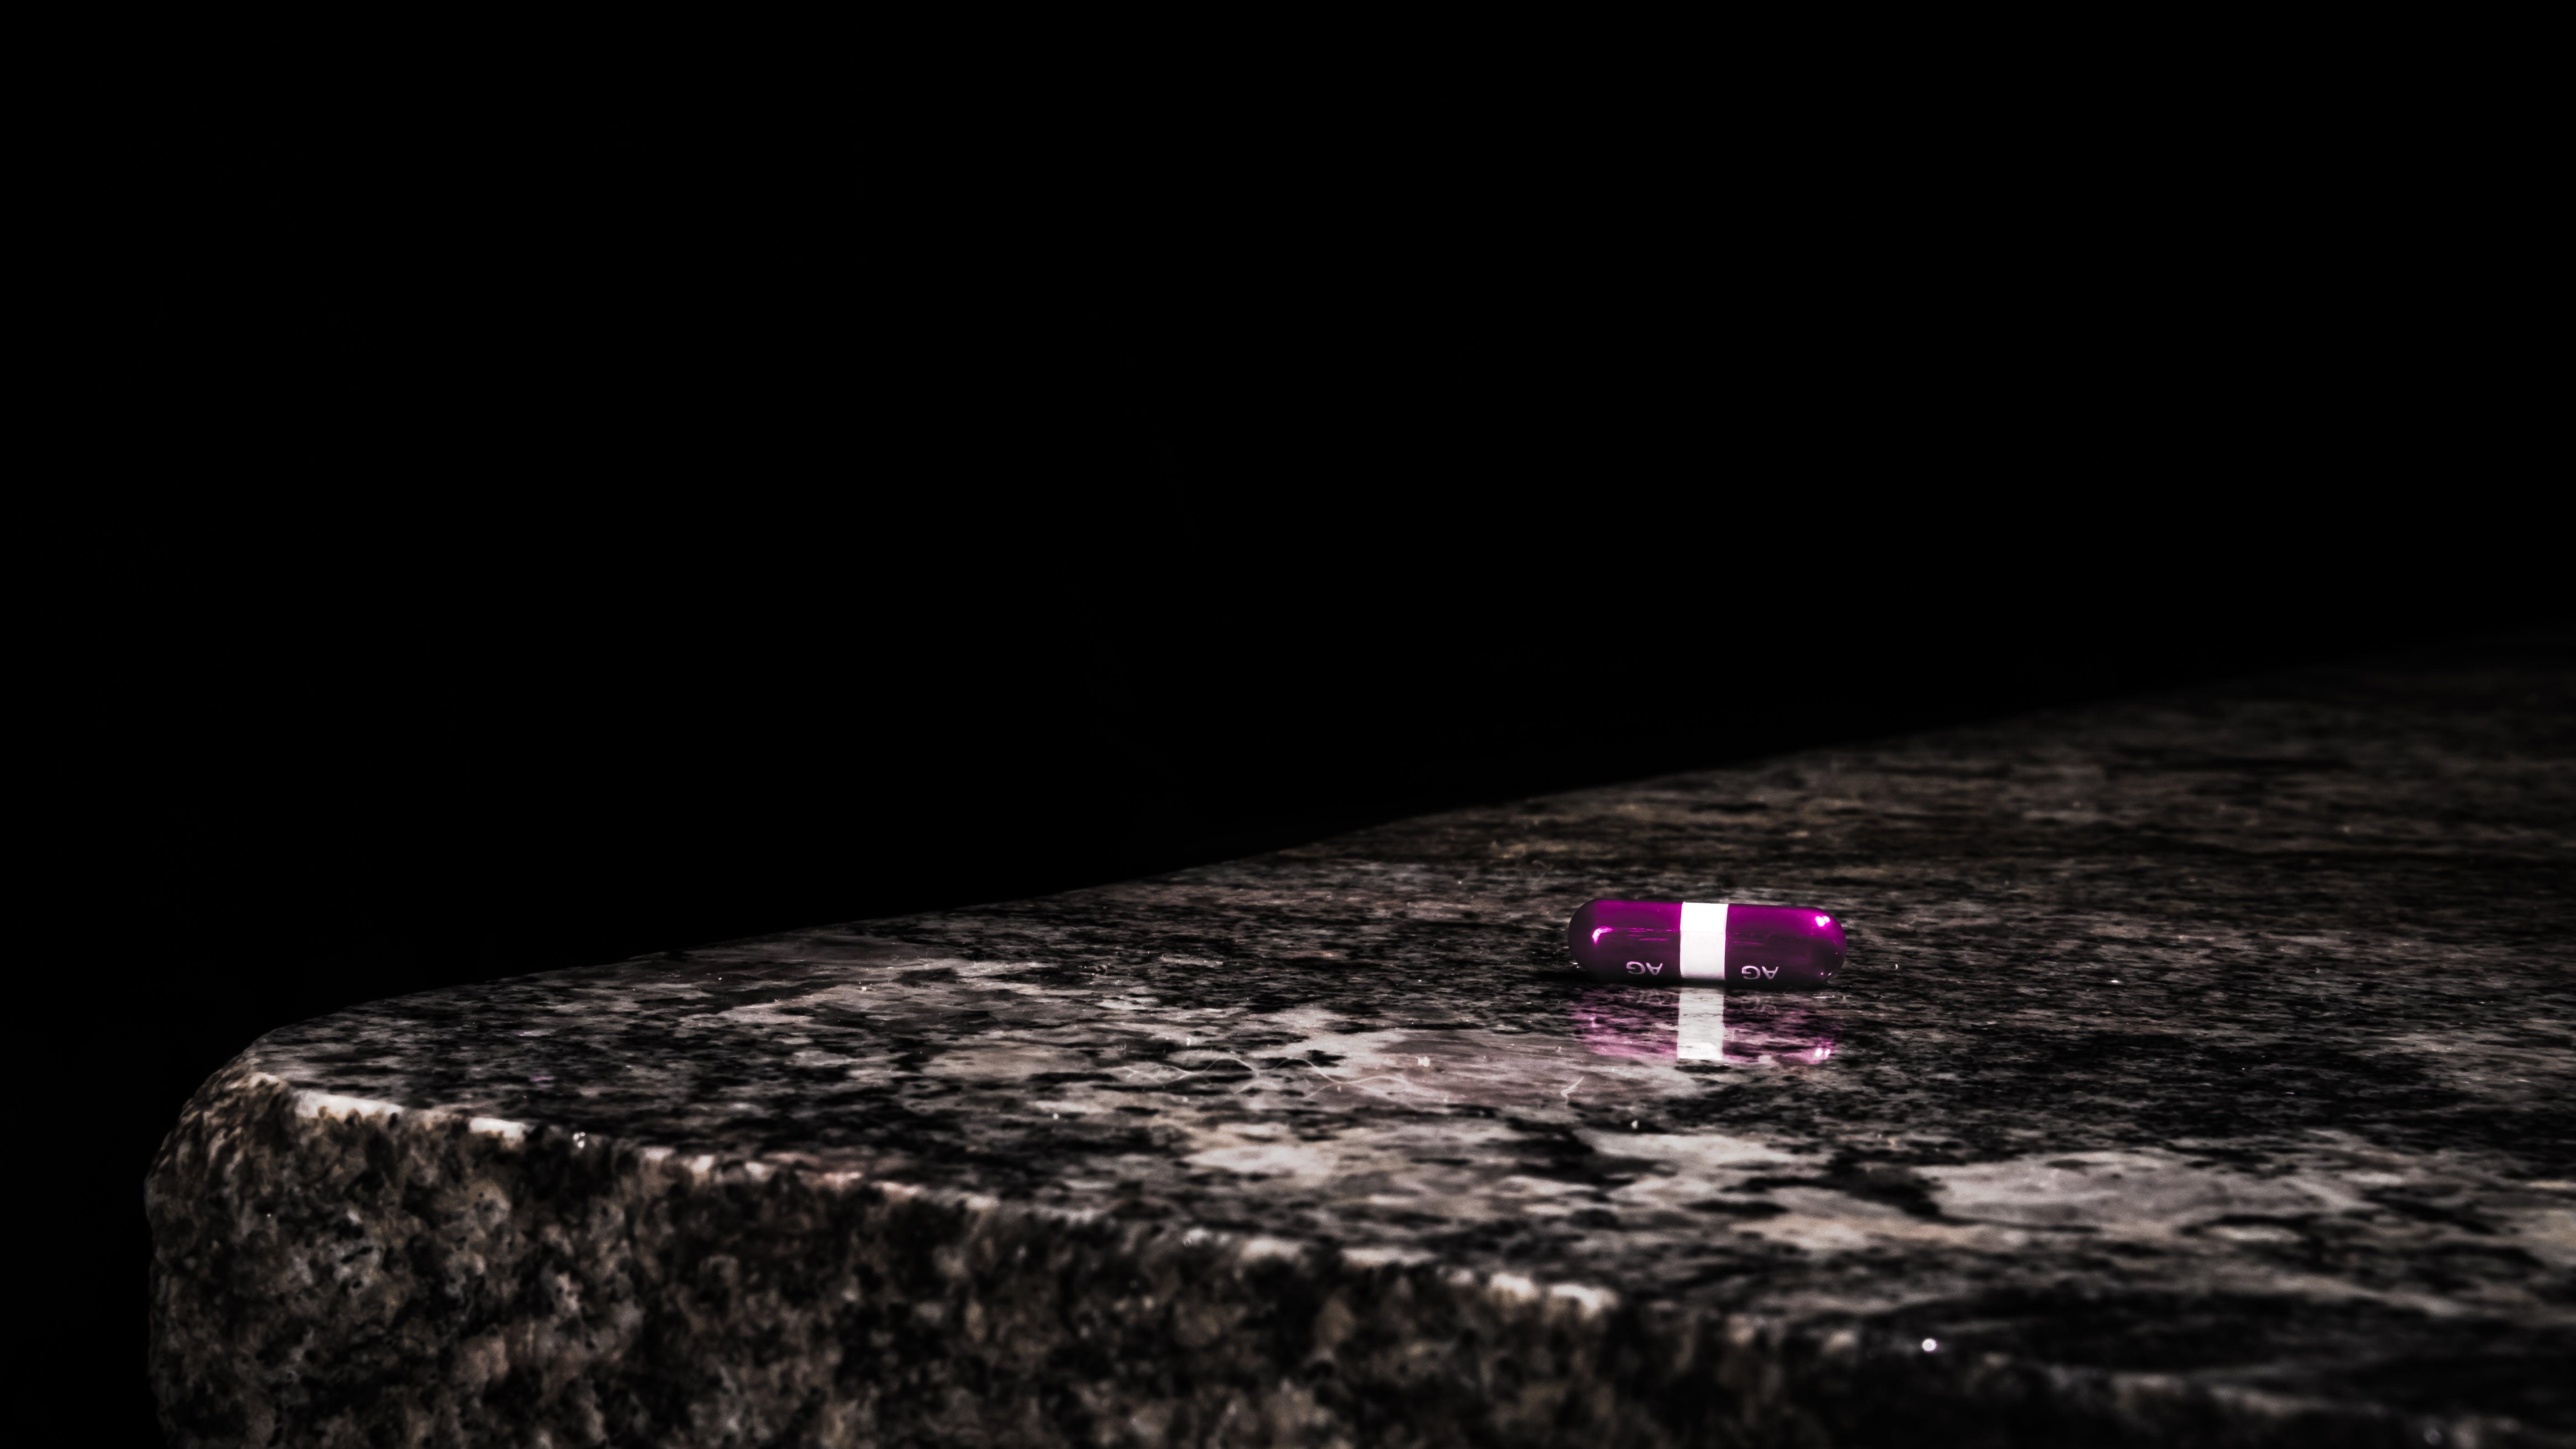 black, capsule, dark